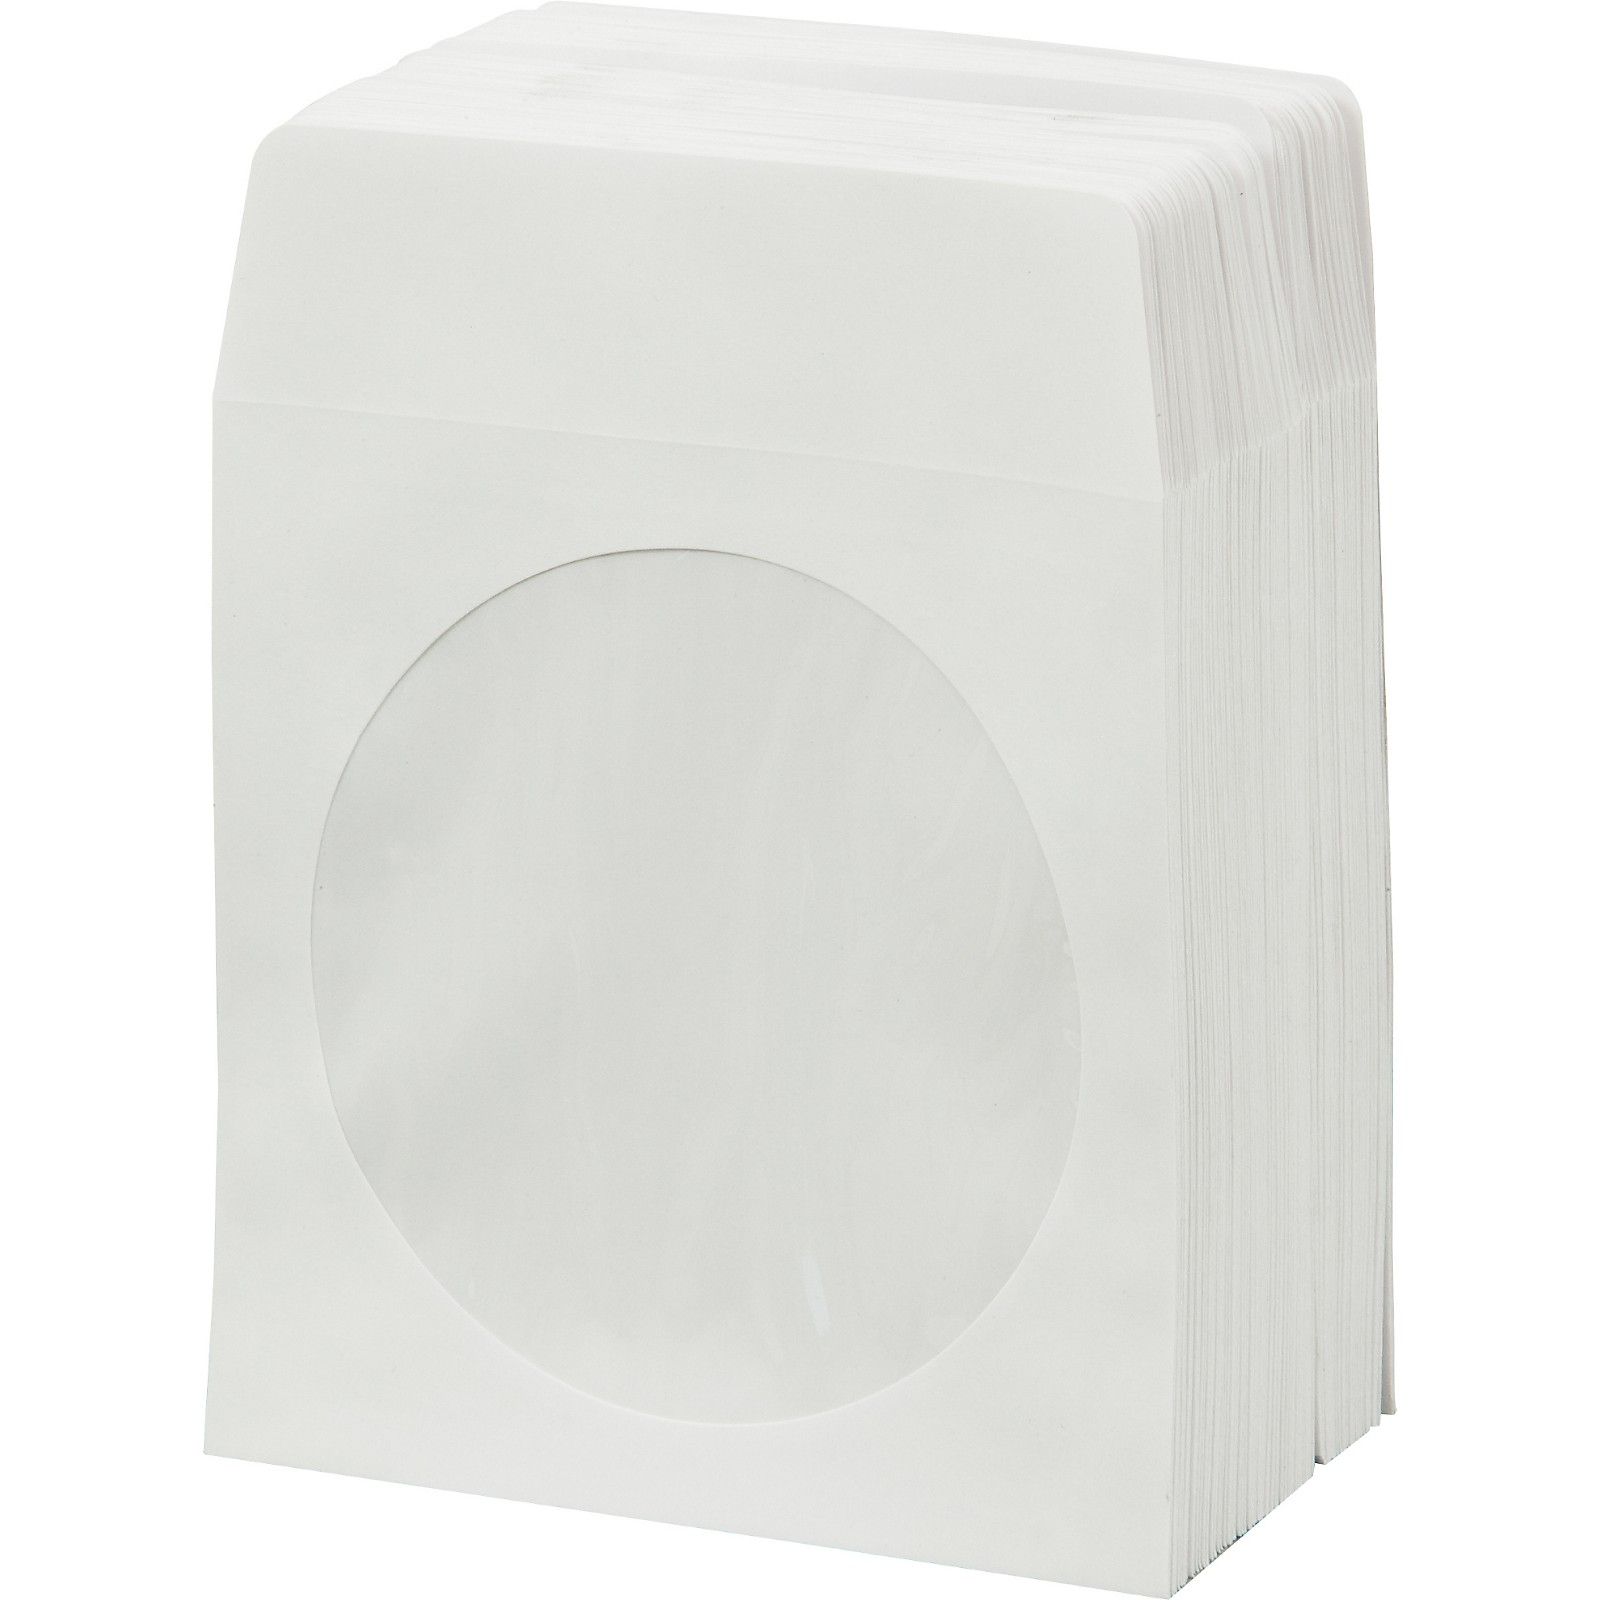 BK Media CD & DVD Paper Sleeves with Window 100-Pack